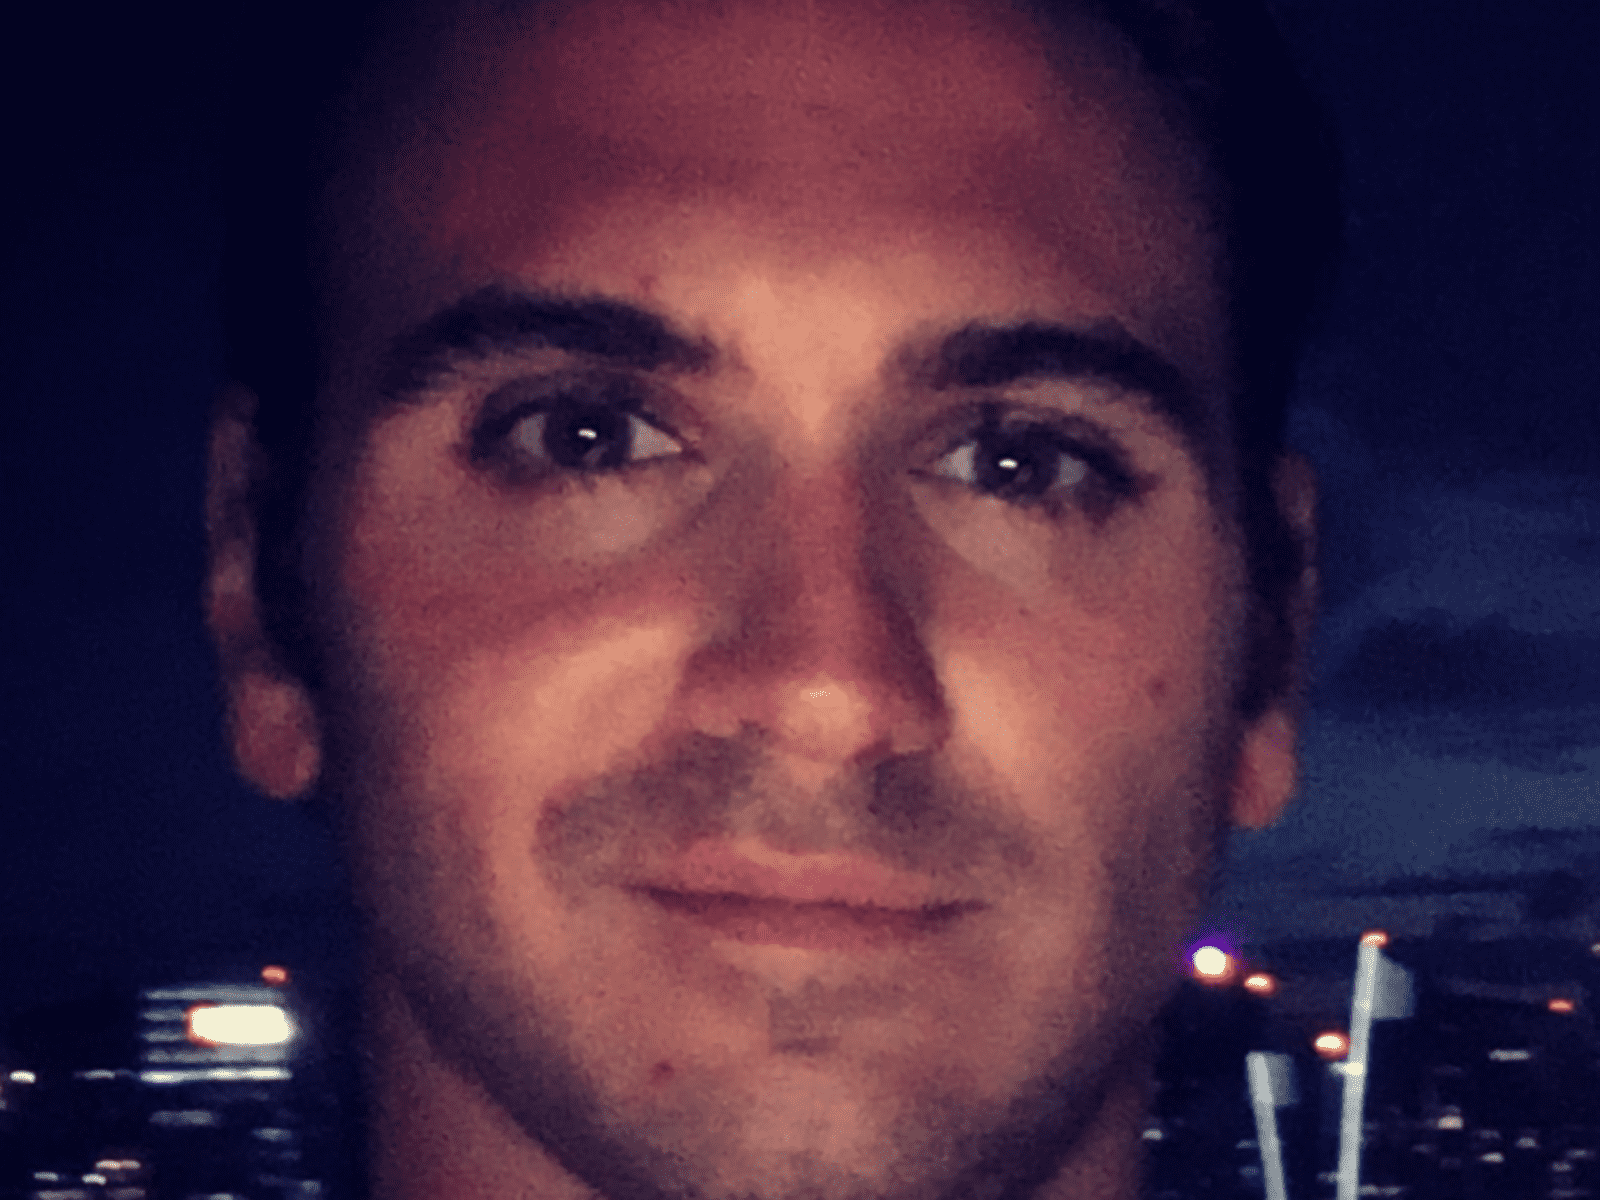 Zachary from Miami Beach, Florida, United States